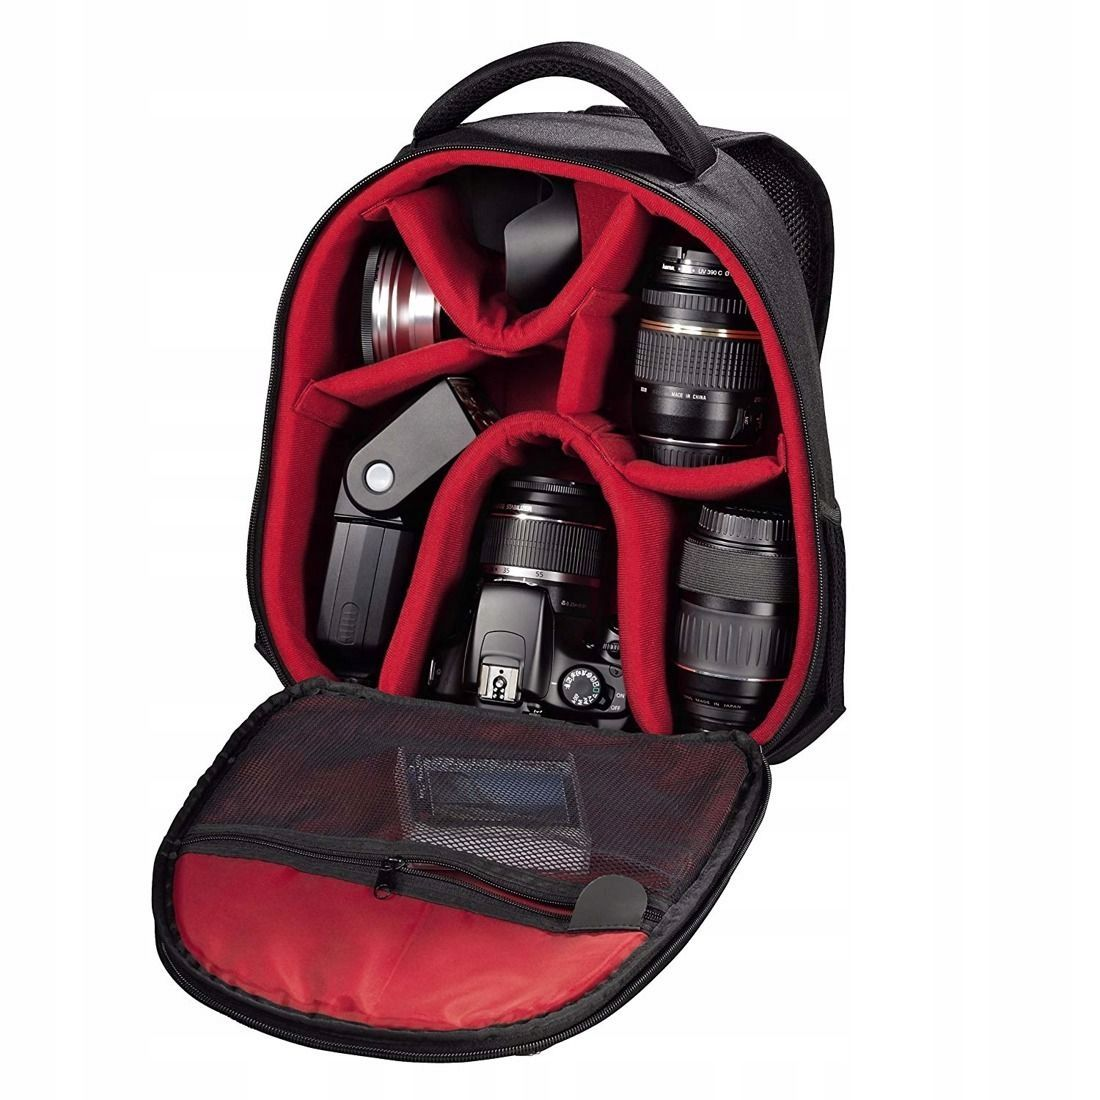 Plecak Fotograficzny Hama Do Aparatu Nikon Canon 7843614688 Oficjalne Archiwum Allegro Camera Bag Bags Camera